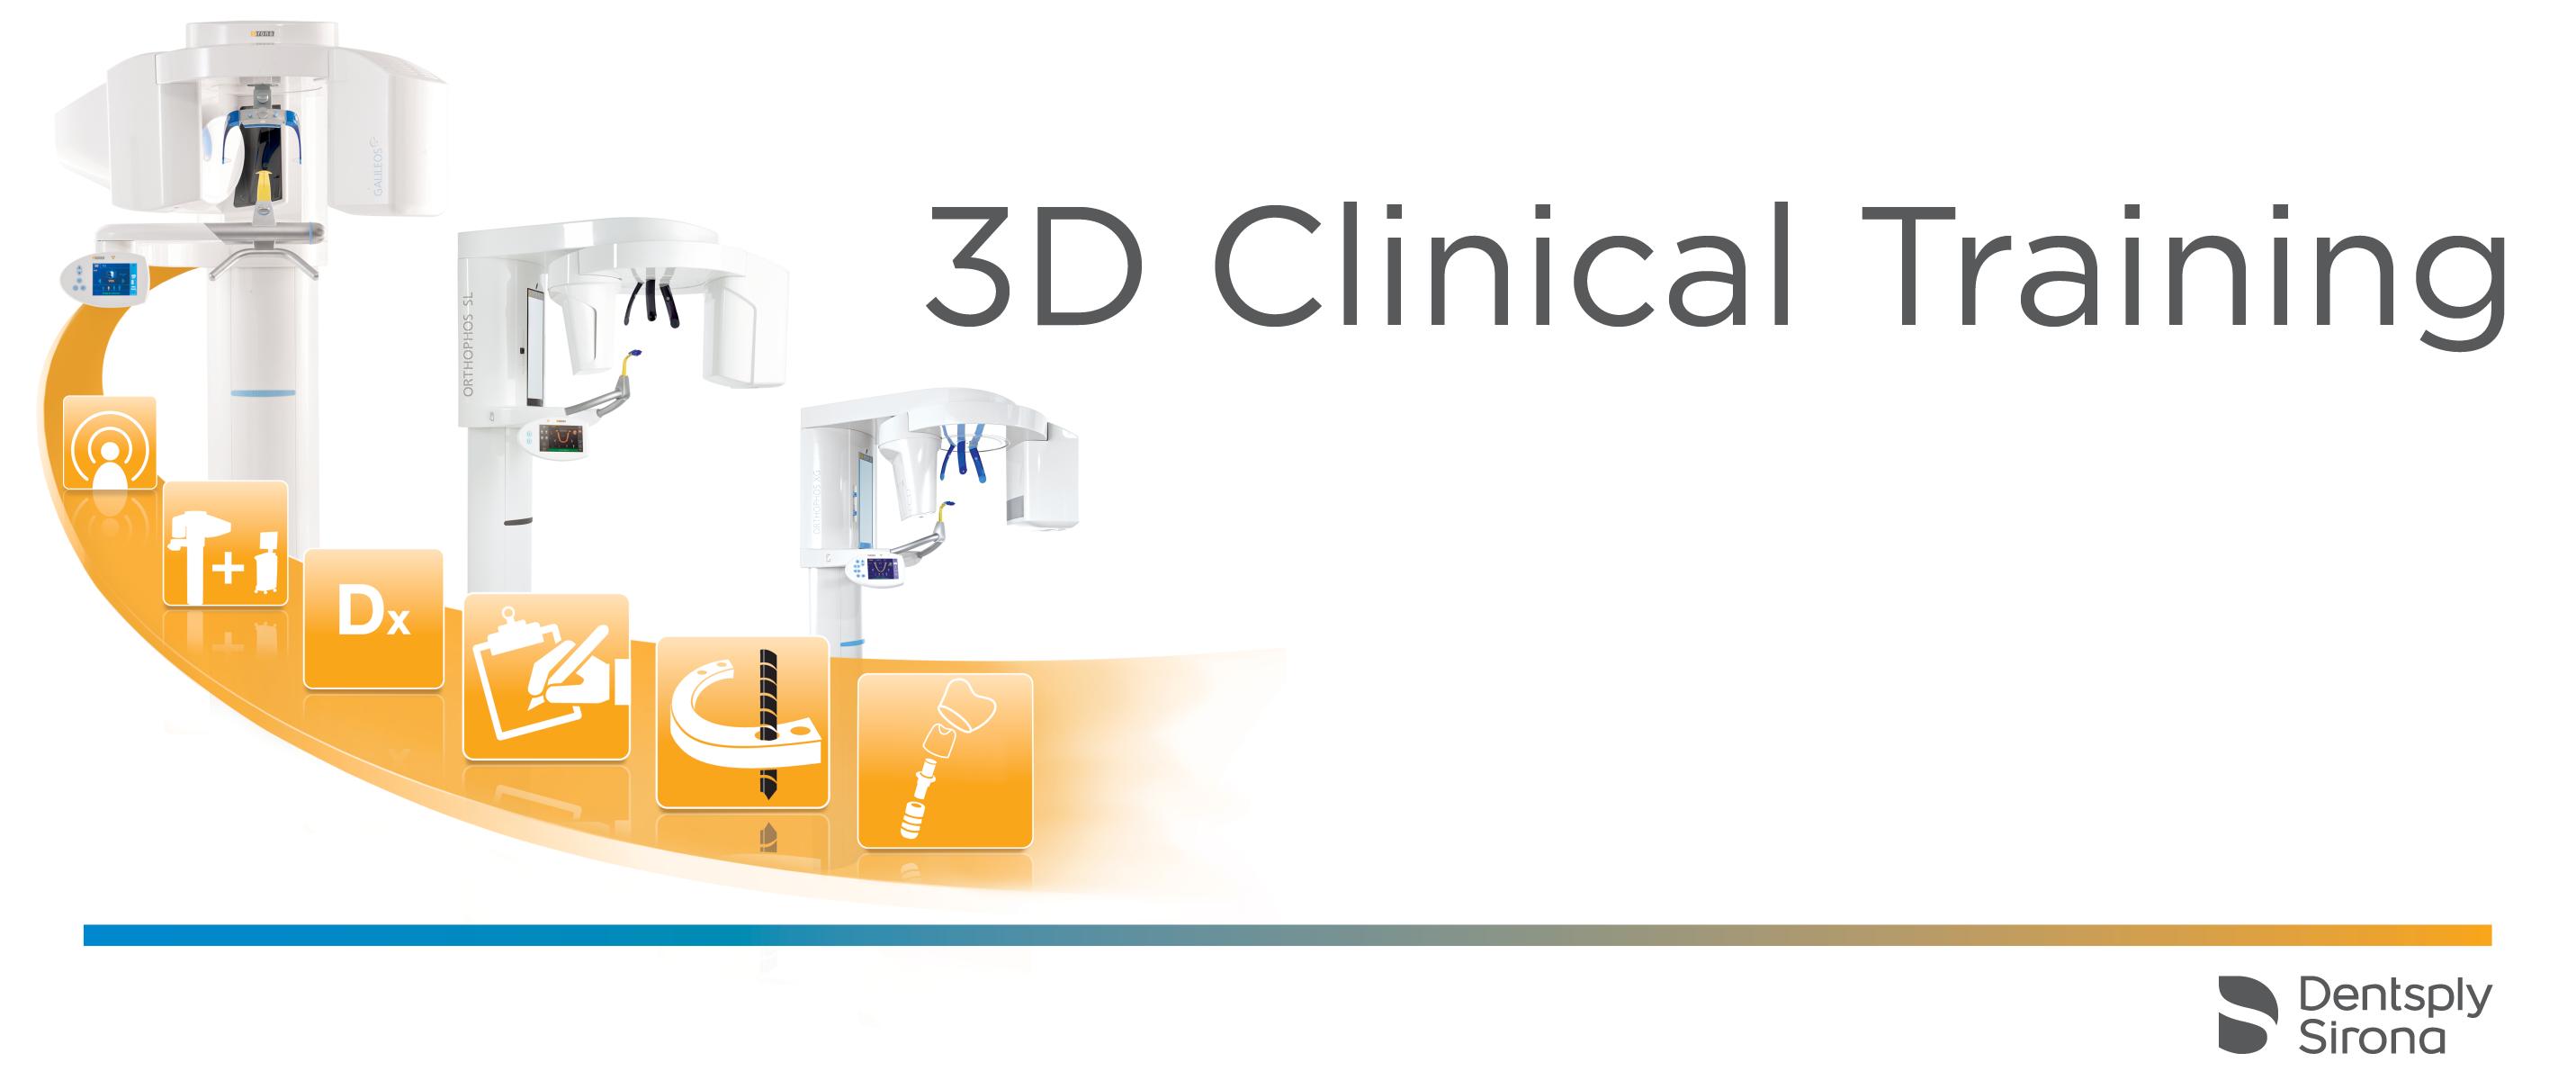 2017 Dentsply Sirona 3D Clinical Training